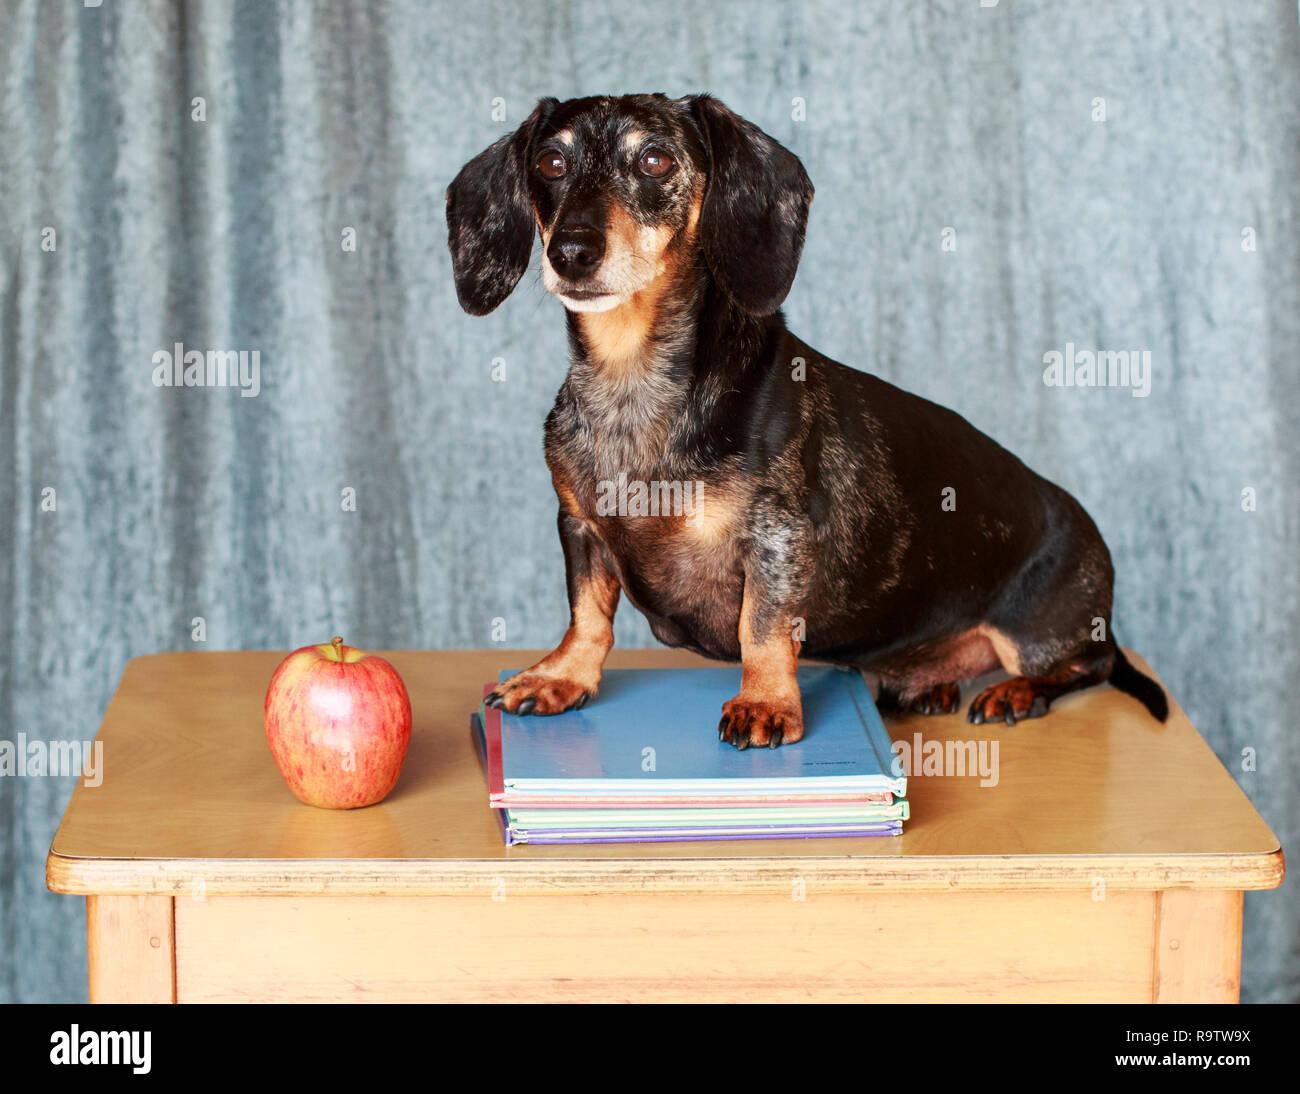 Dapple Dachshund Sitting on a school desk - Stock Image